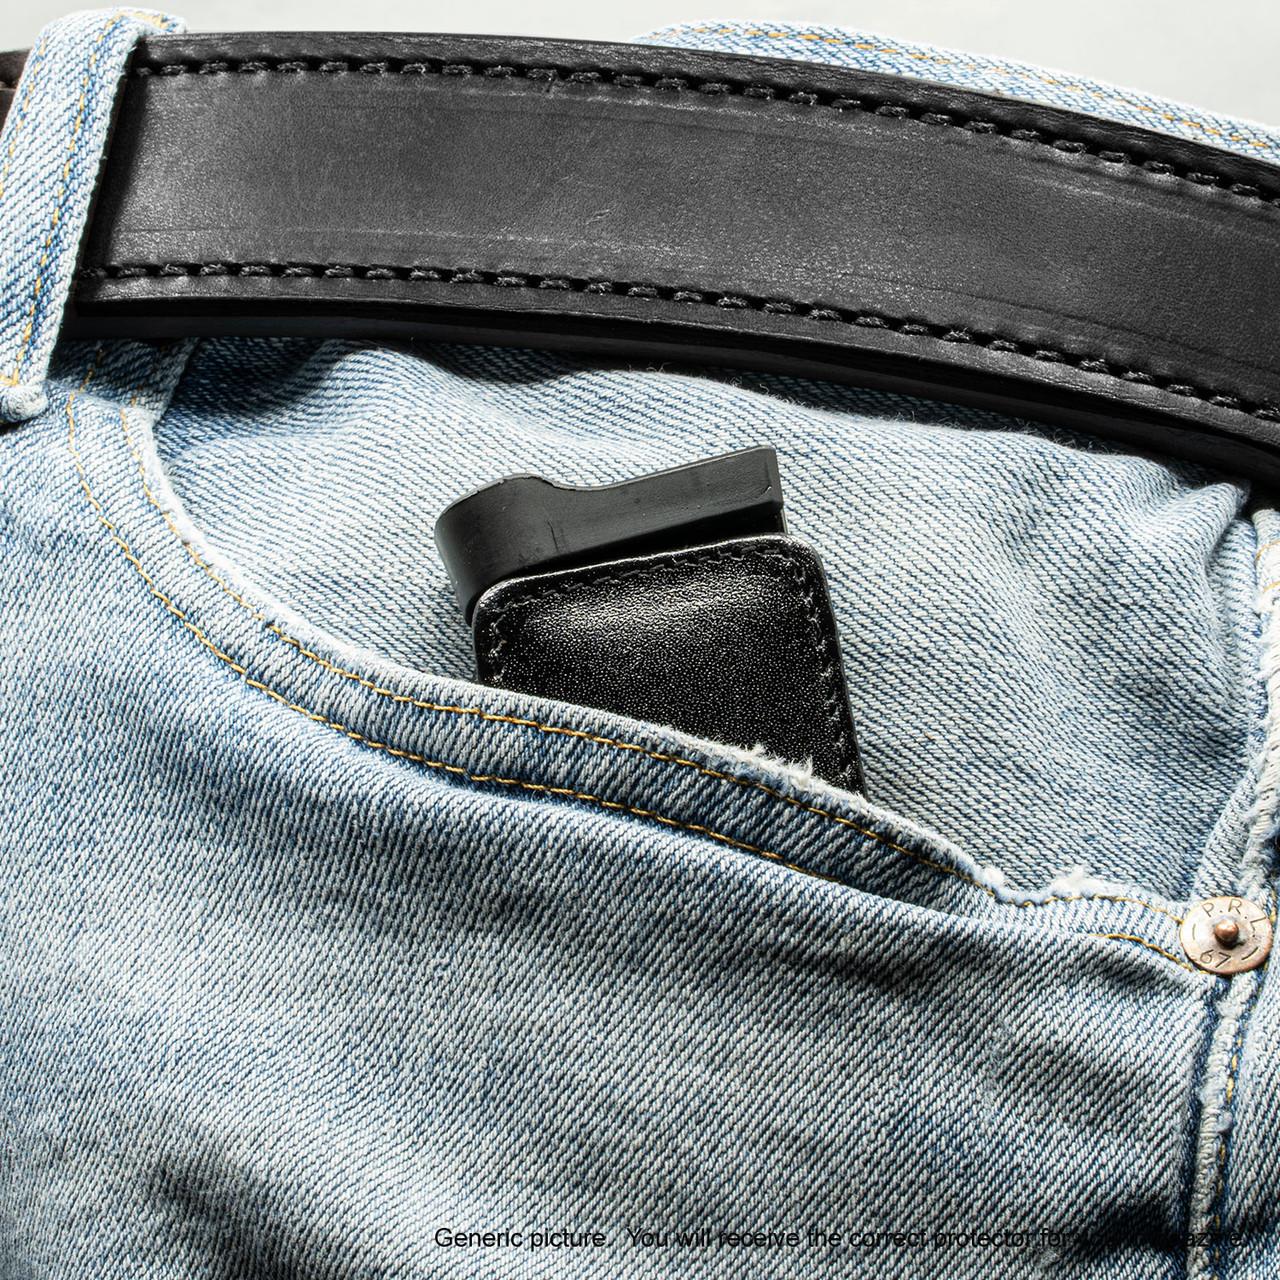 Kahr S9 Black Leather Magazine Pocket Protector